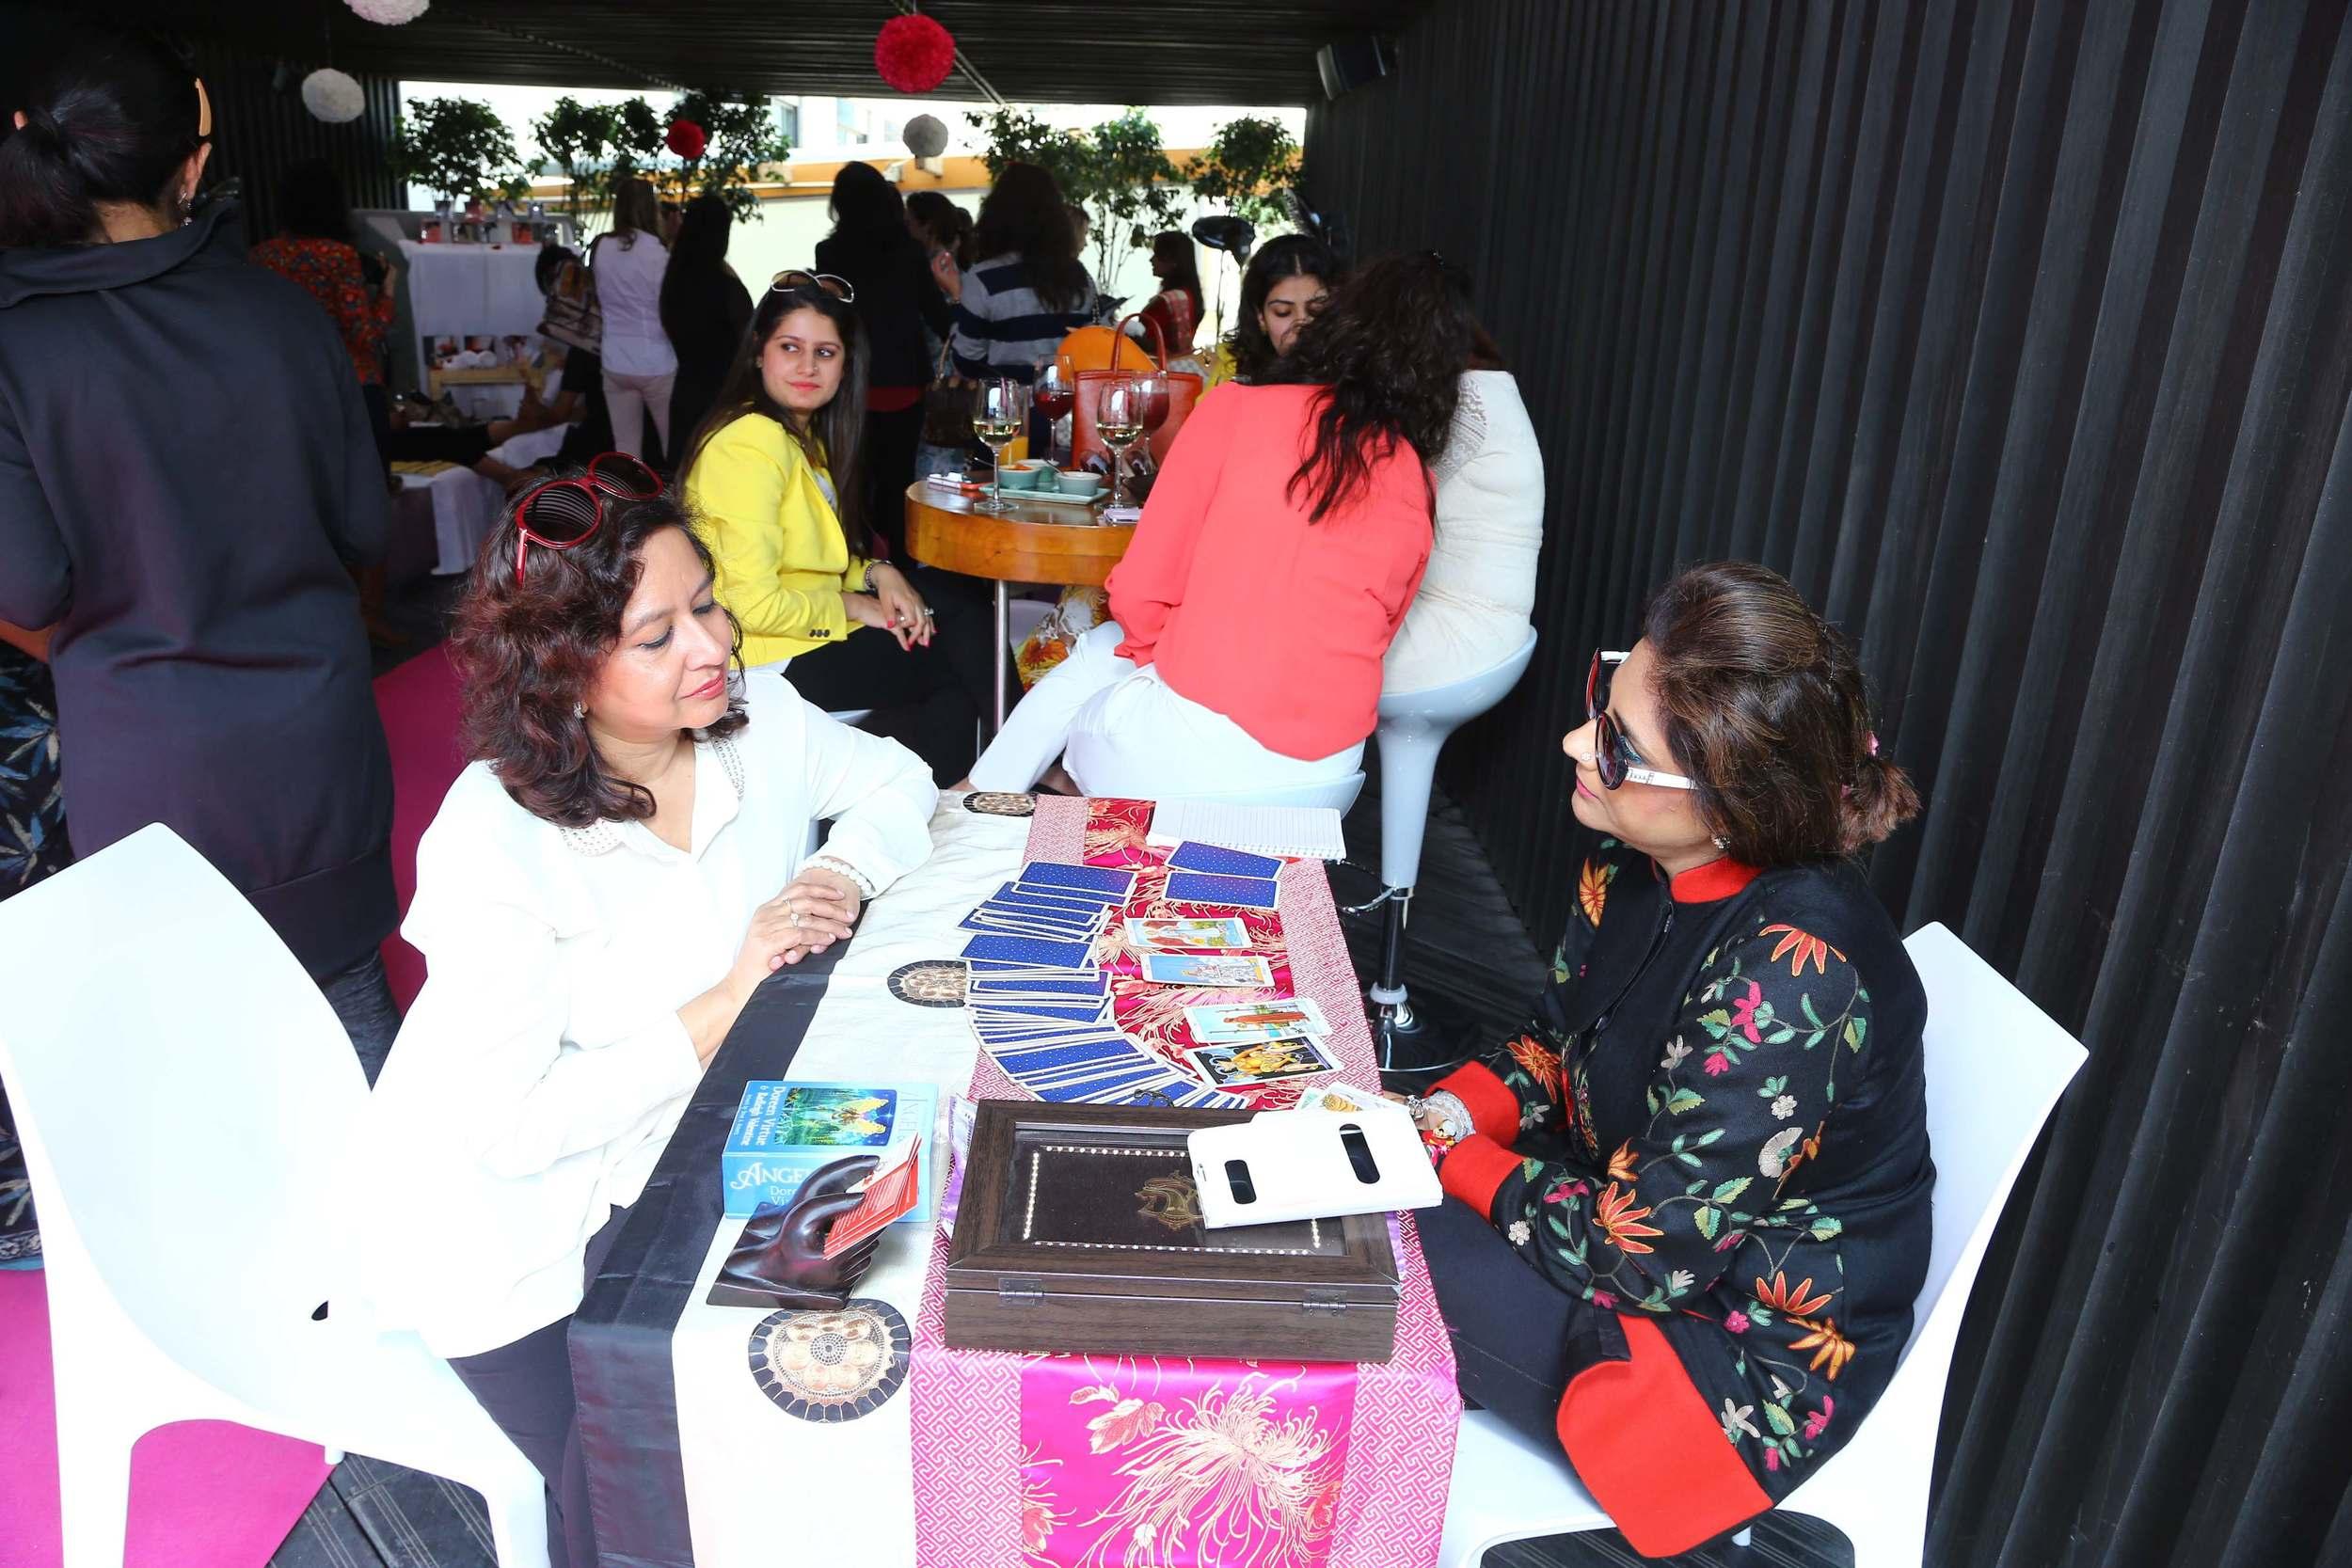 DLF Emporio - Women's Day - Tarot card sessions.jpg